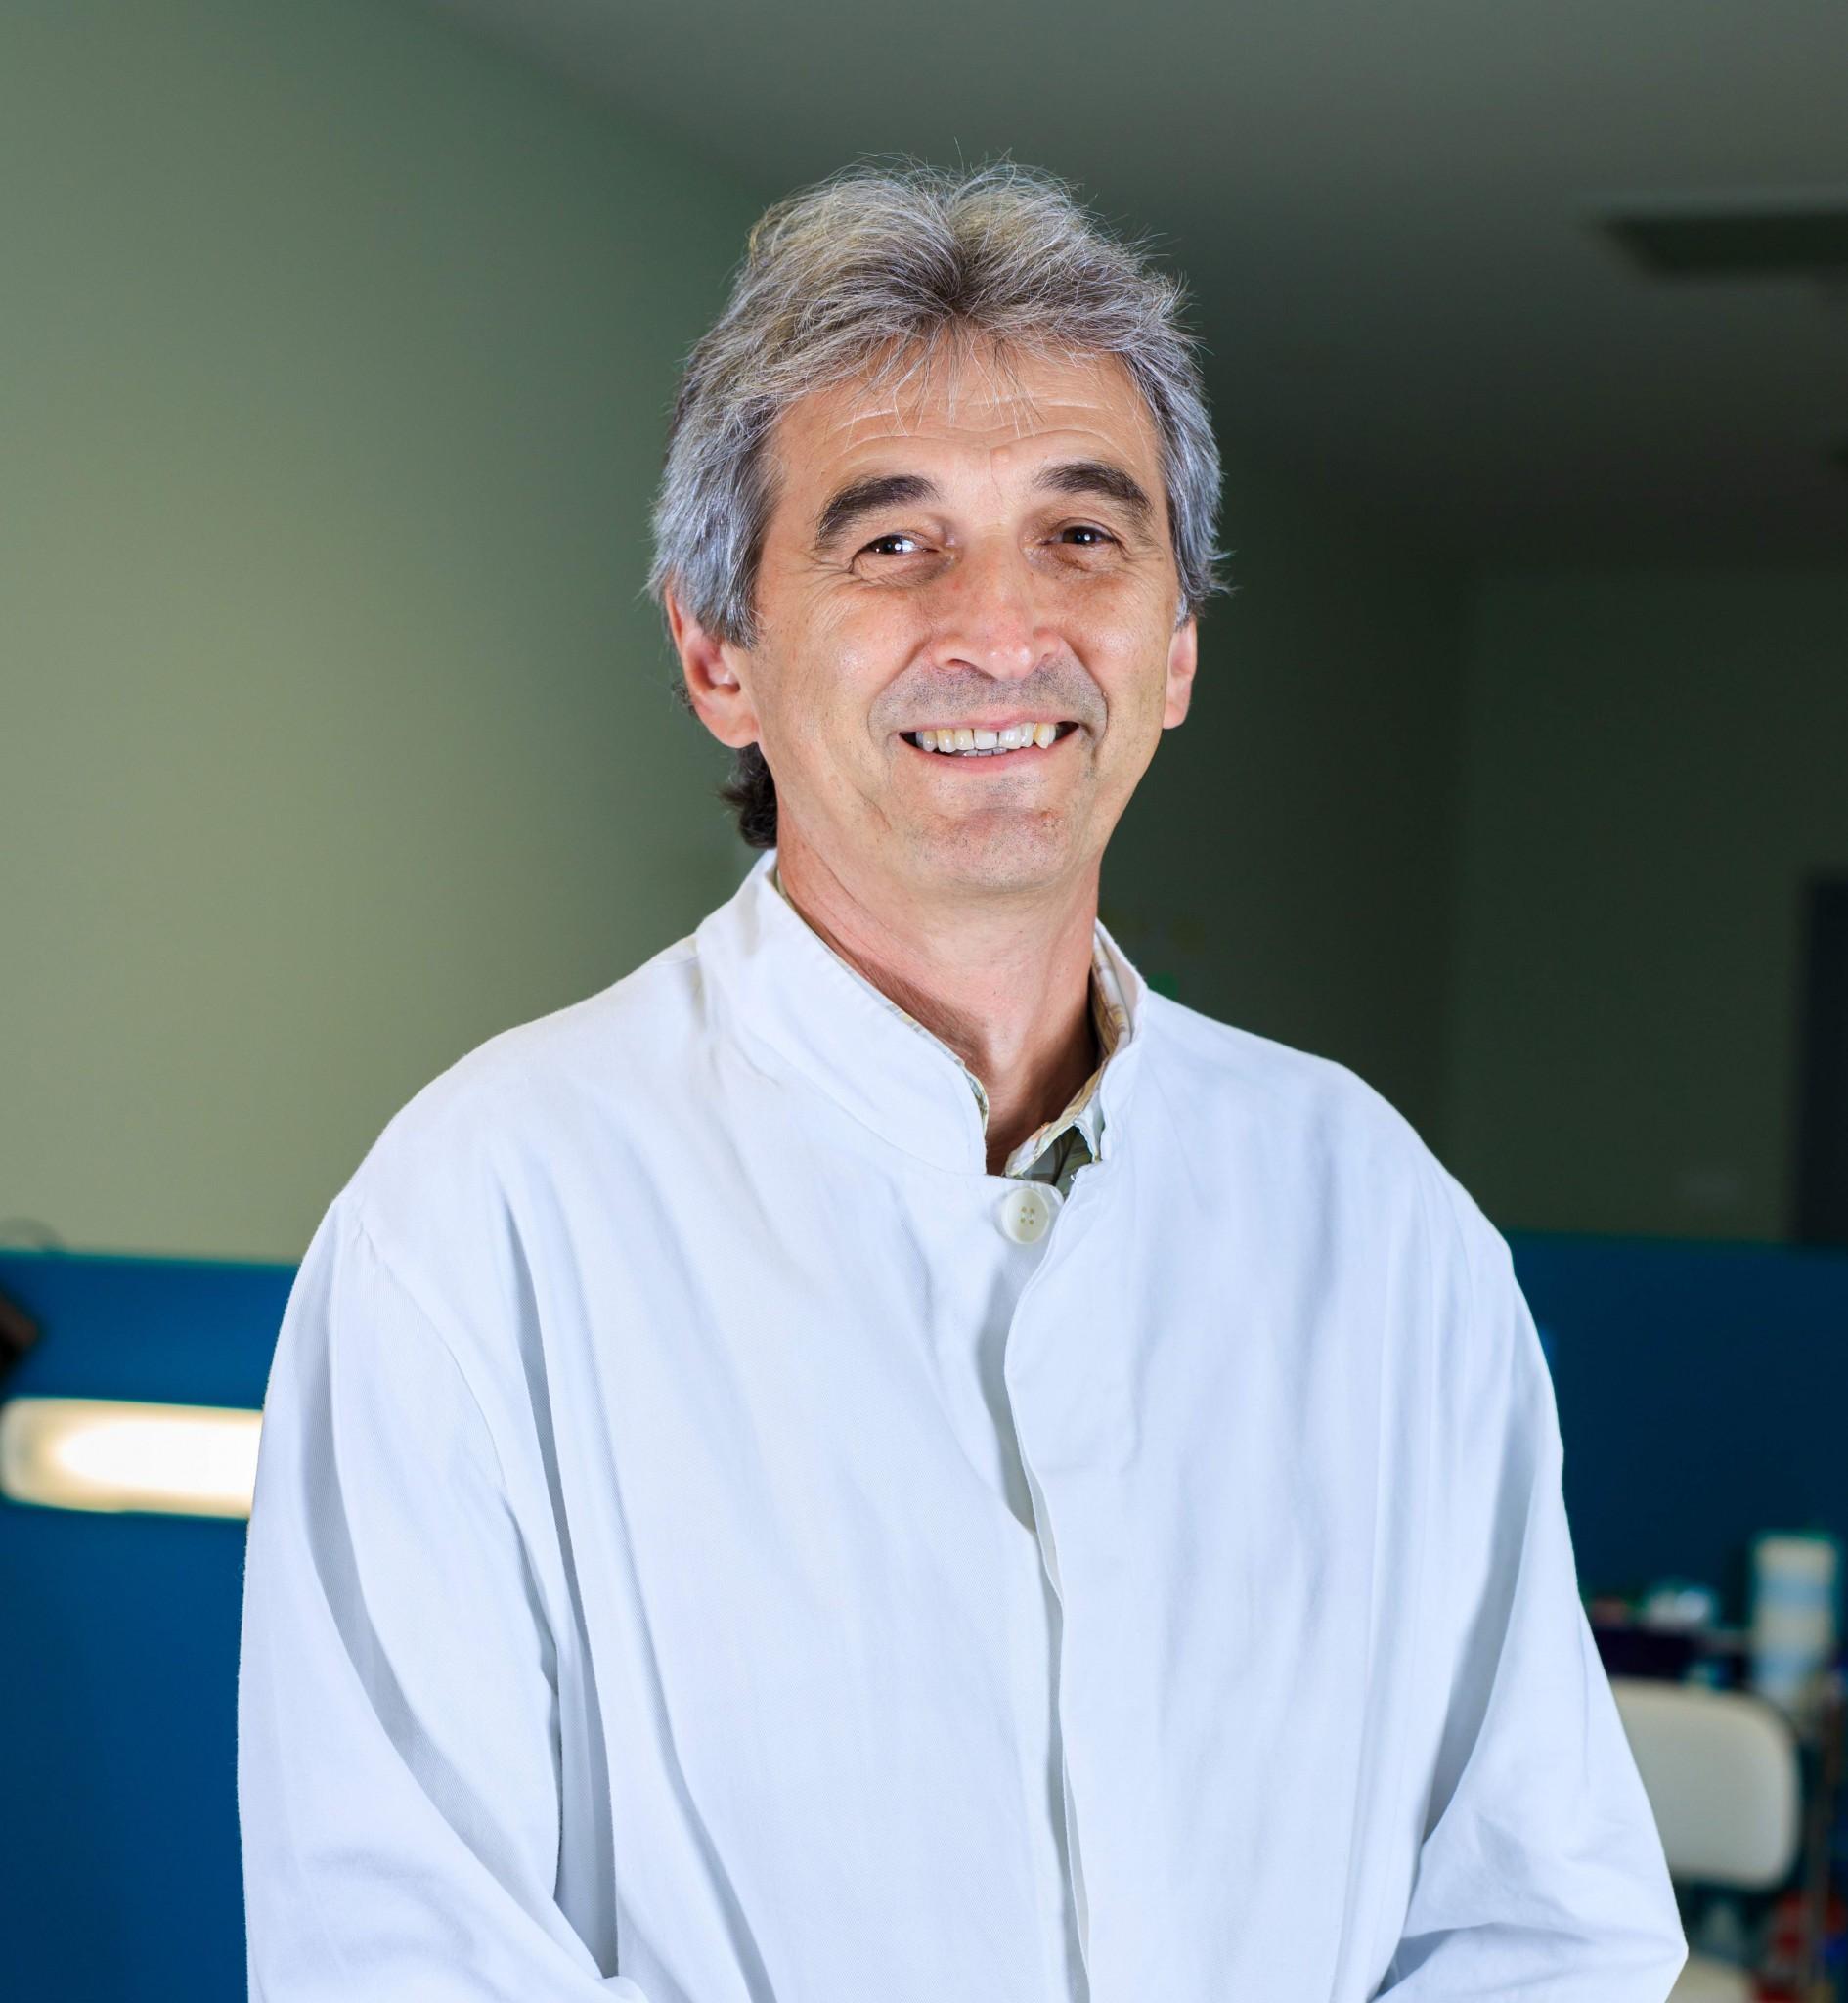 Др. Ненад Бабич